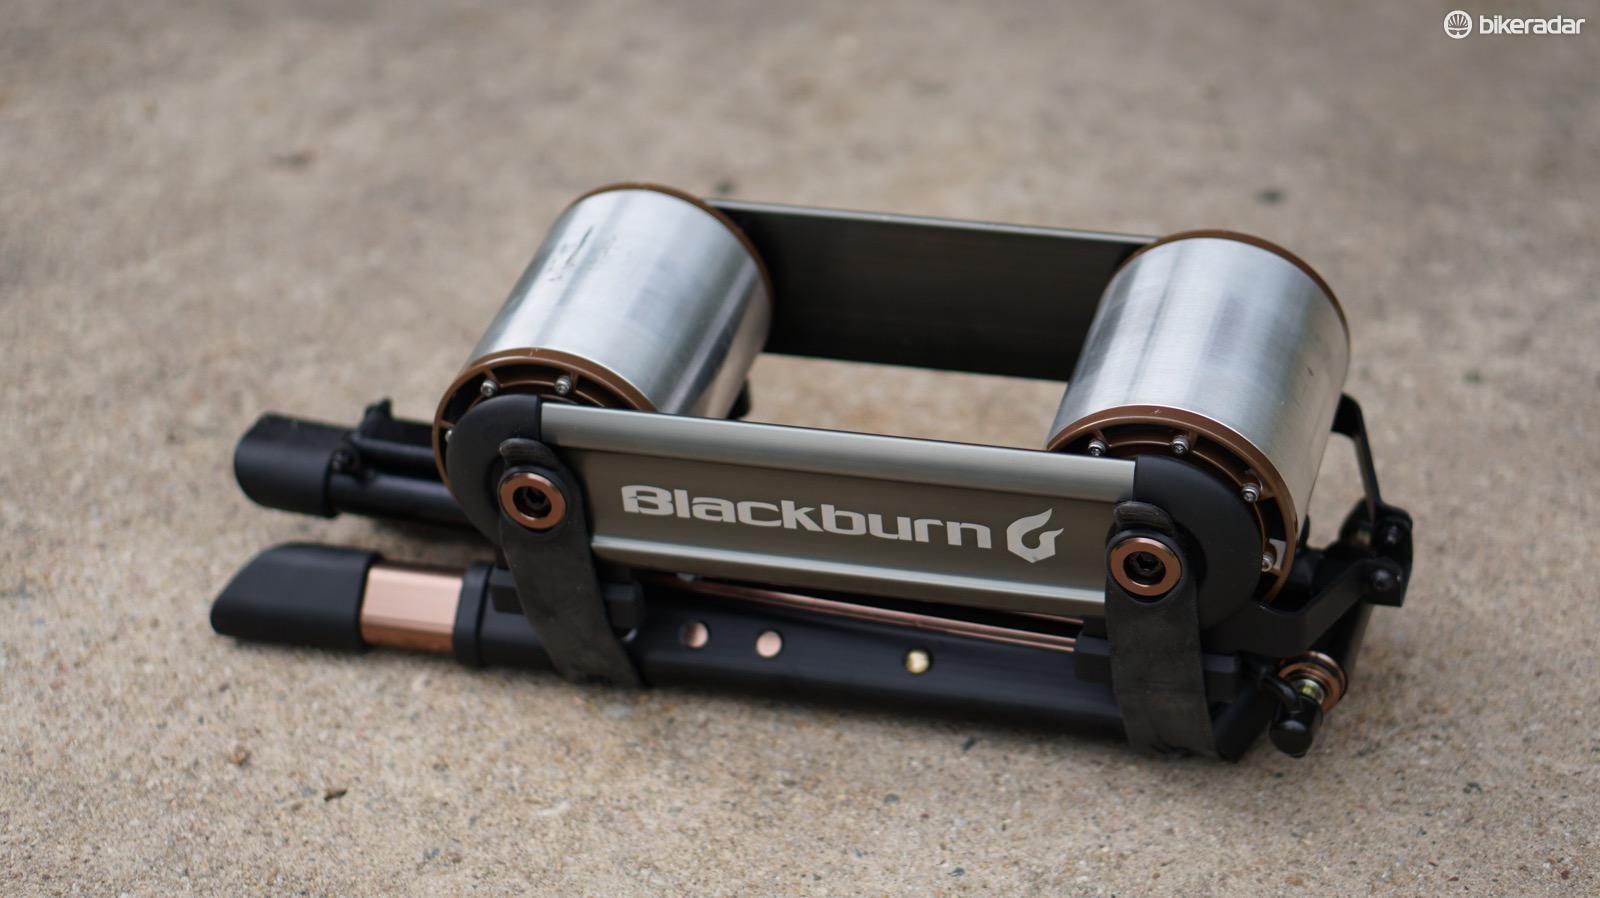 Blackburn's Raceday Fluid is a portable trainer